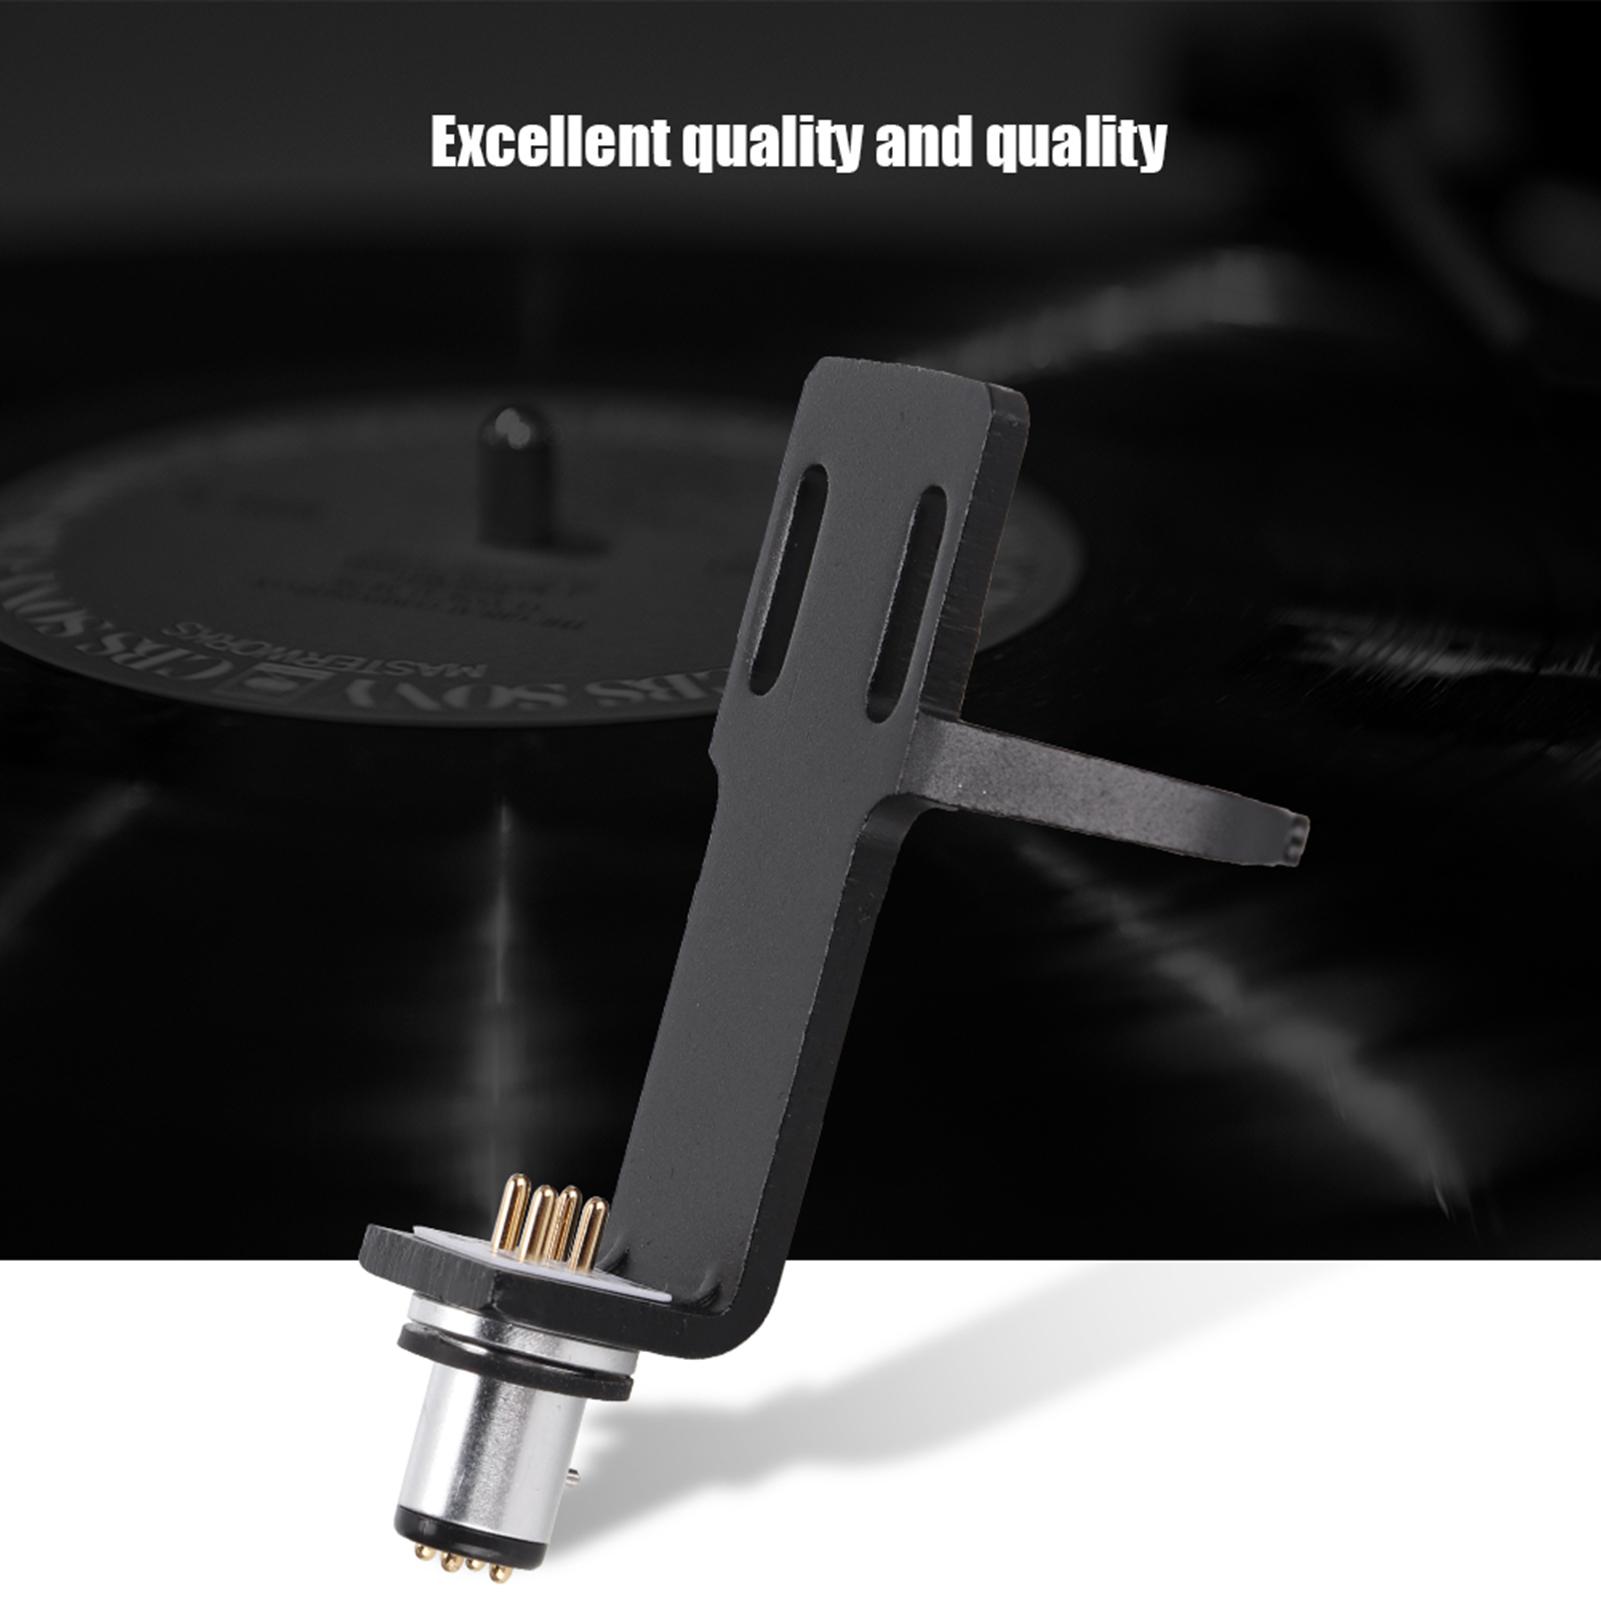 Universal-Phono-Stylus-Holder-Headshell-Cartridge-Keeper-for-LP-Record-Player thumbnail 37